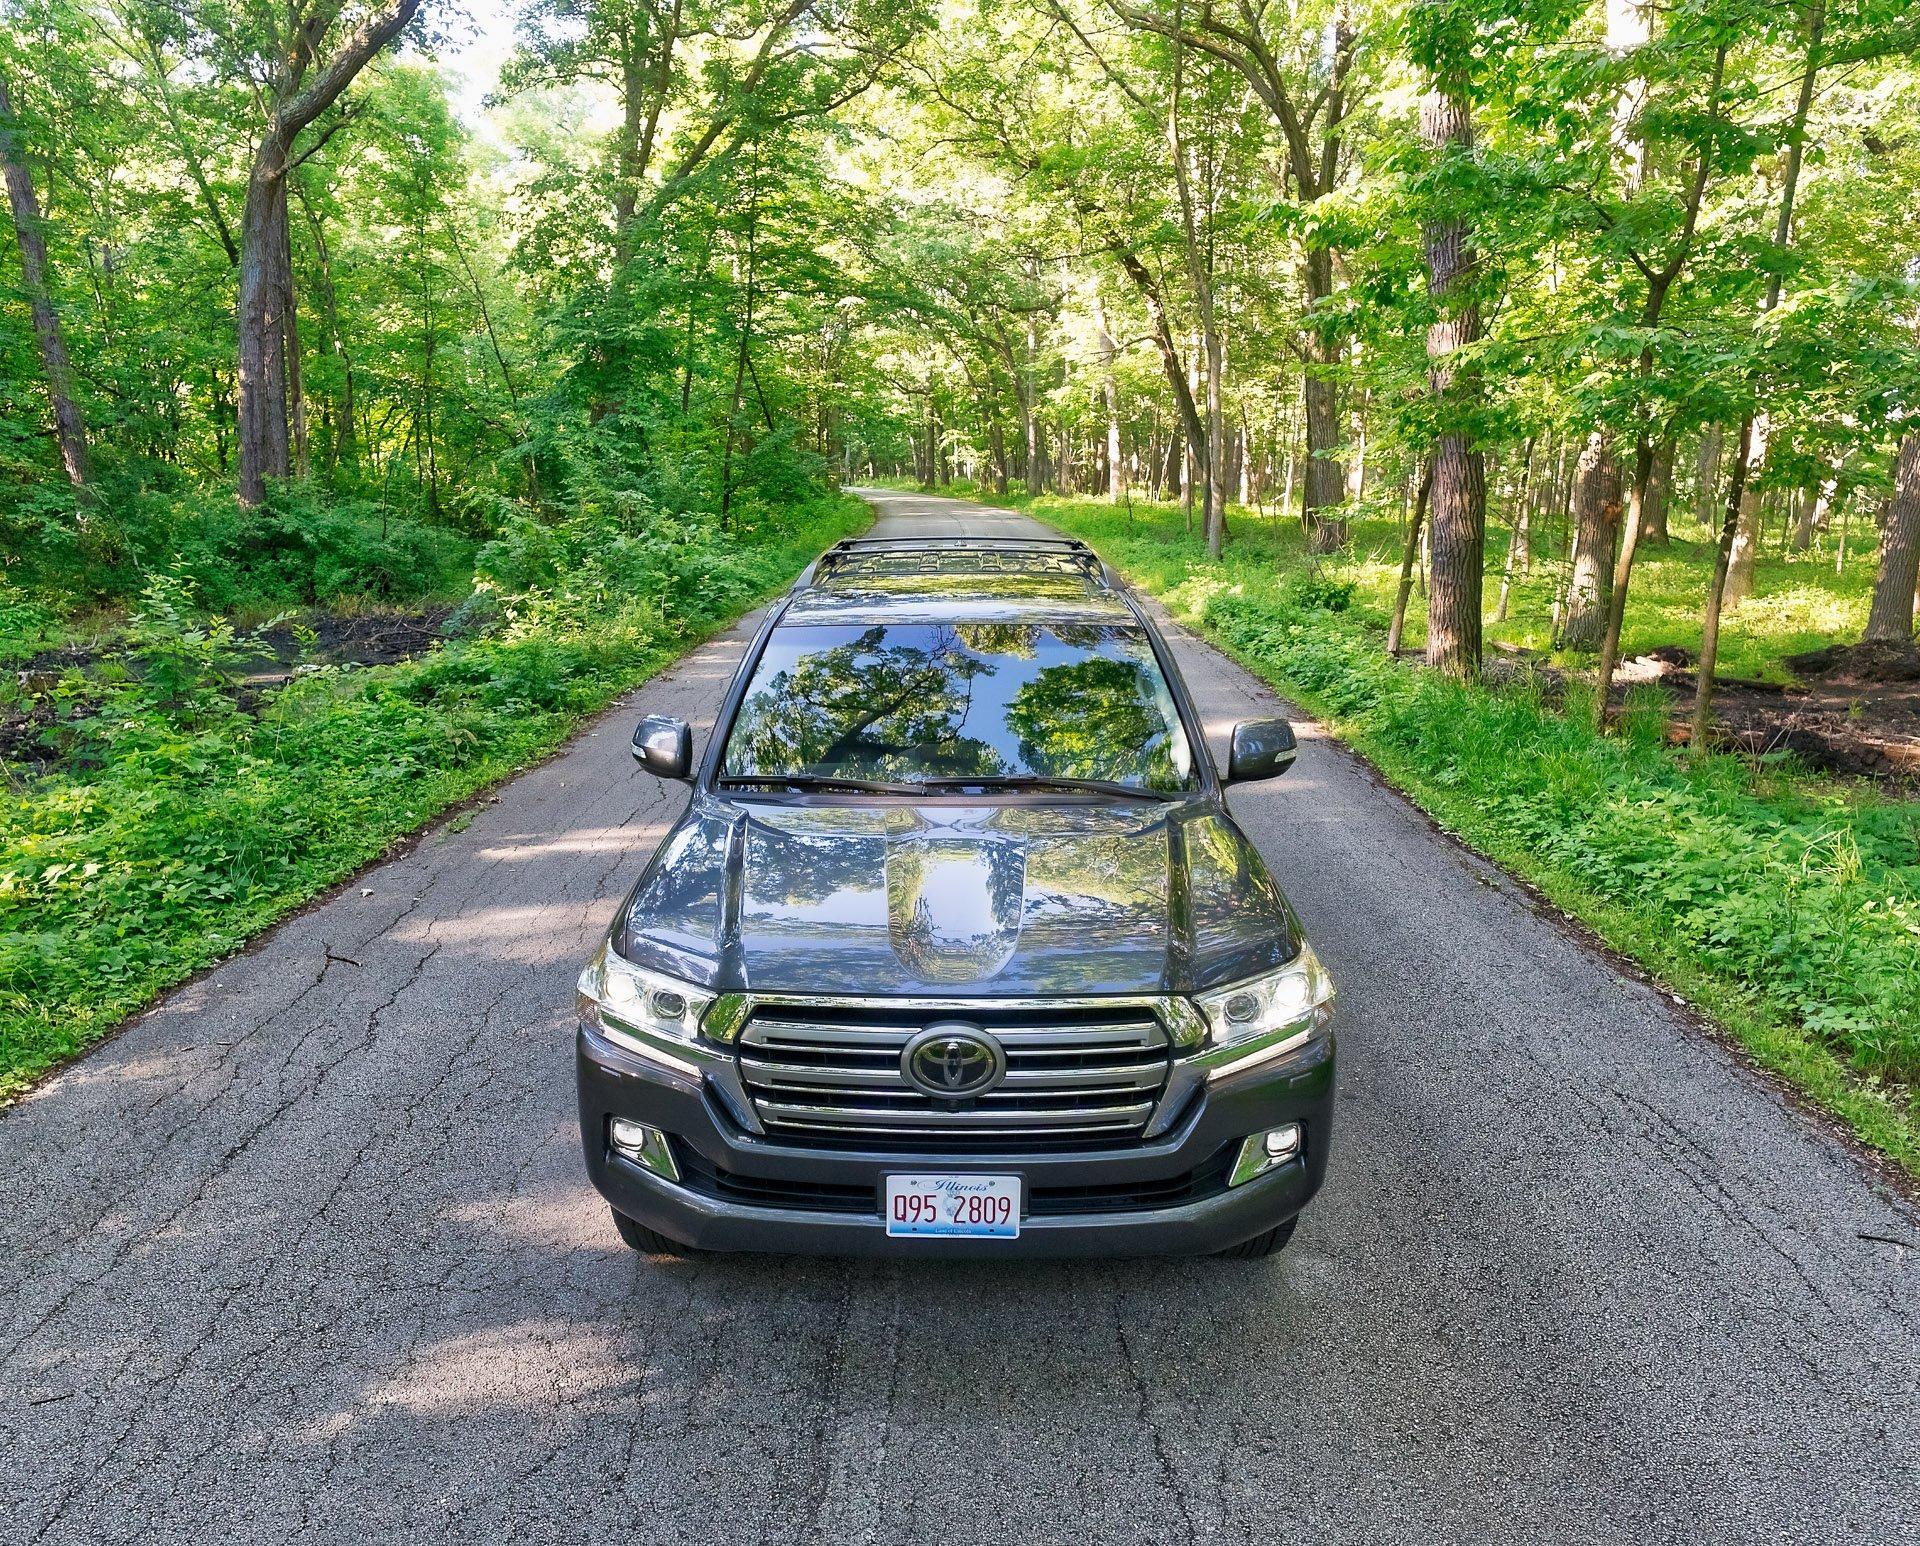 2017 Toyota Land Cruiser Review: A Big Boy for Big Budgets